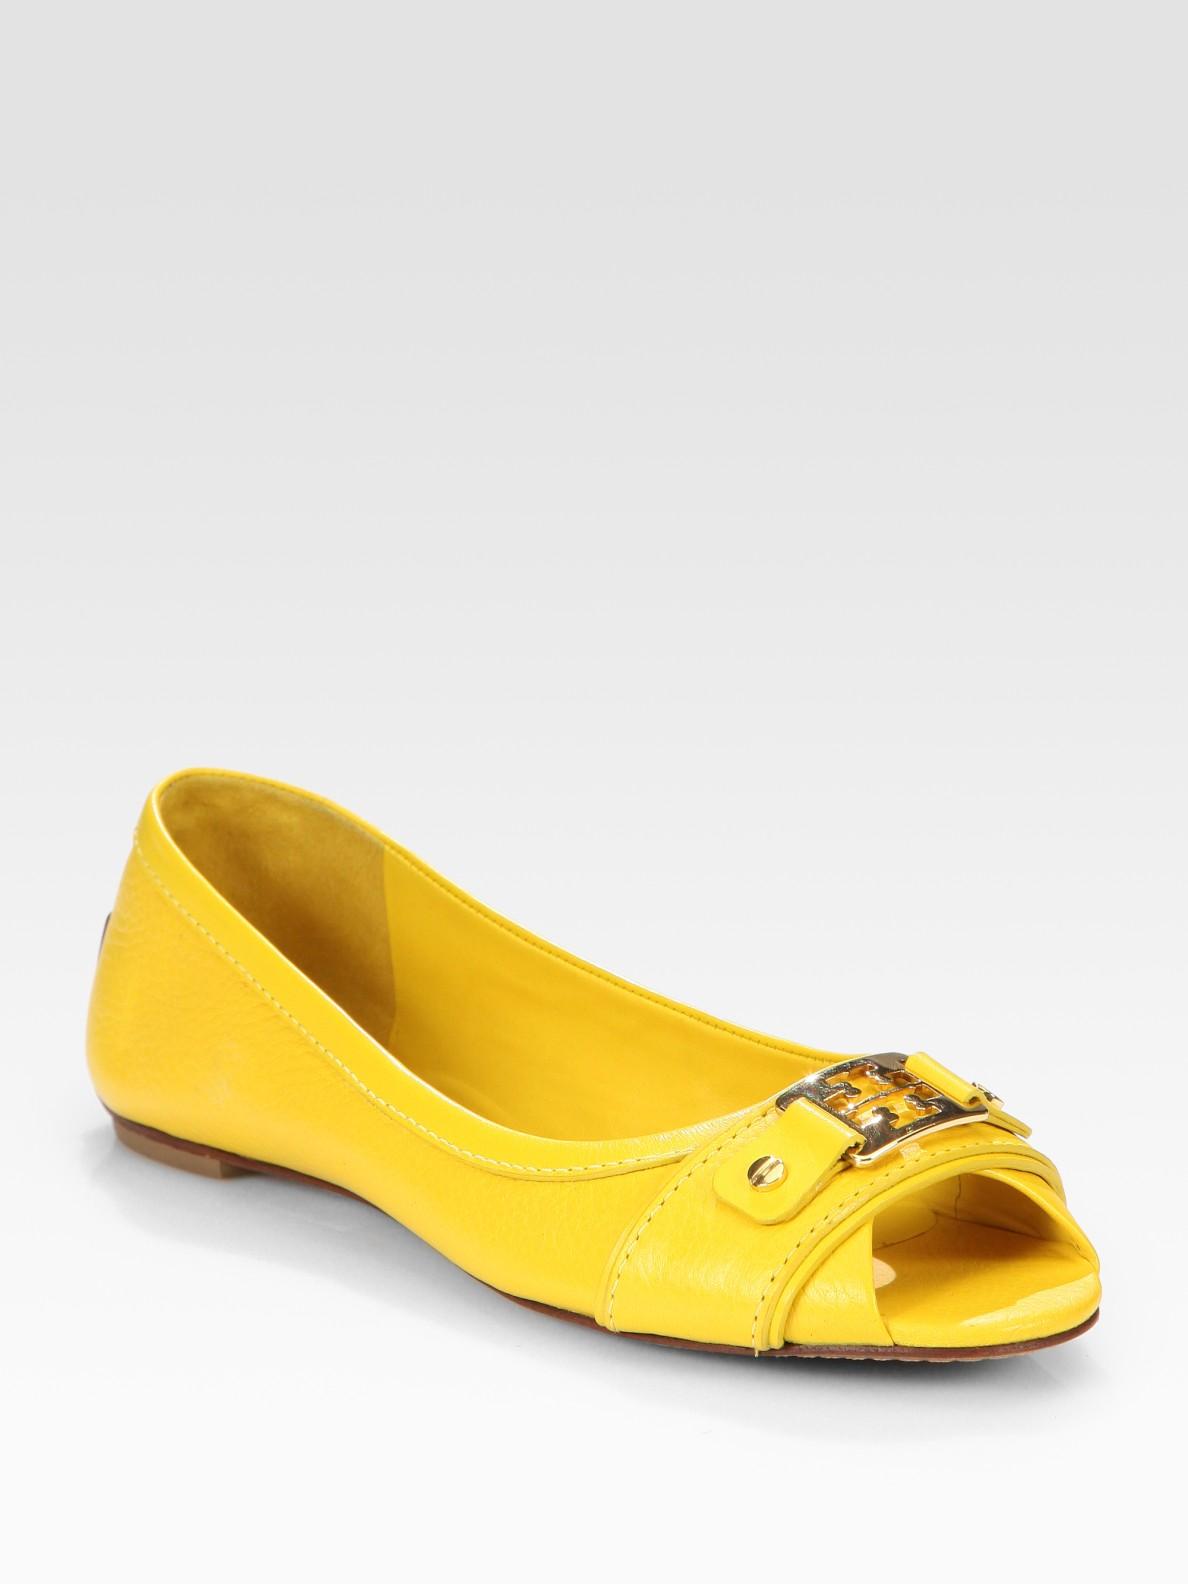 9b5e6924fc78 Lyst - Tory Burch Cline Leather Peep Toe Logo Ballet Flats in Yellow